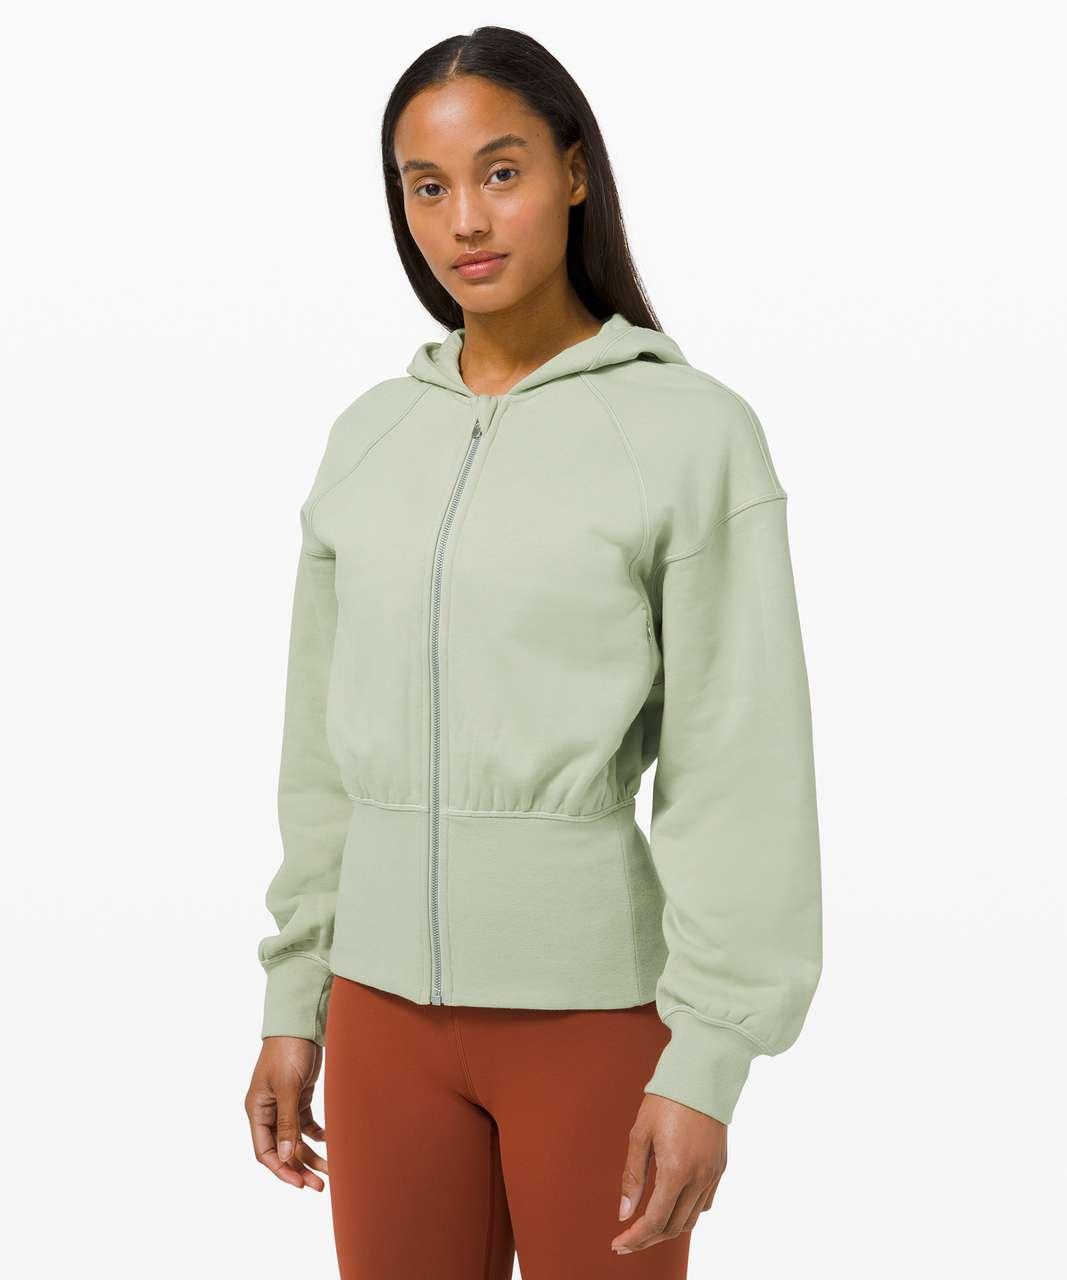 Lululemon Hugged-Waist Cotton Zip Hoodie - Green Fern